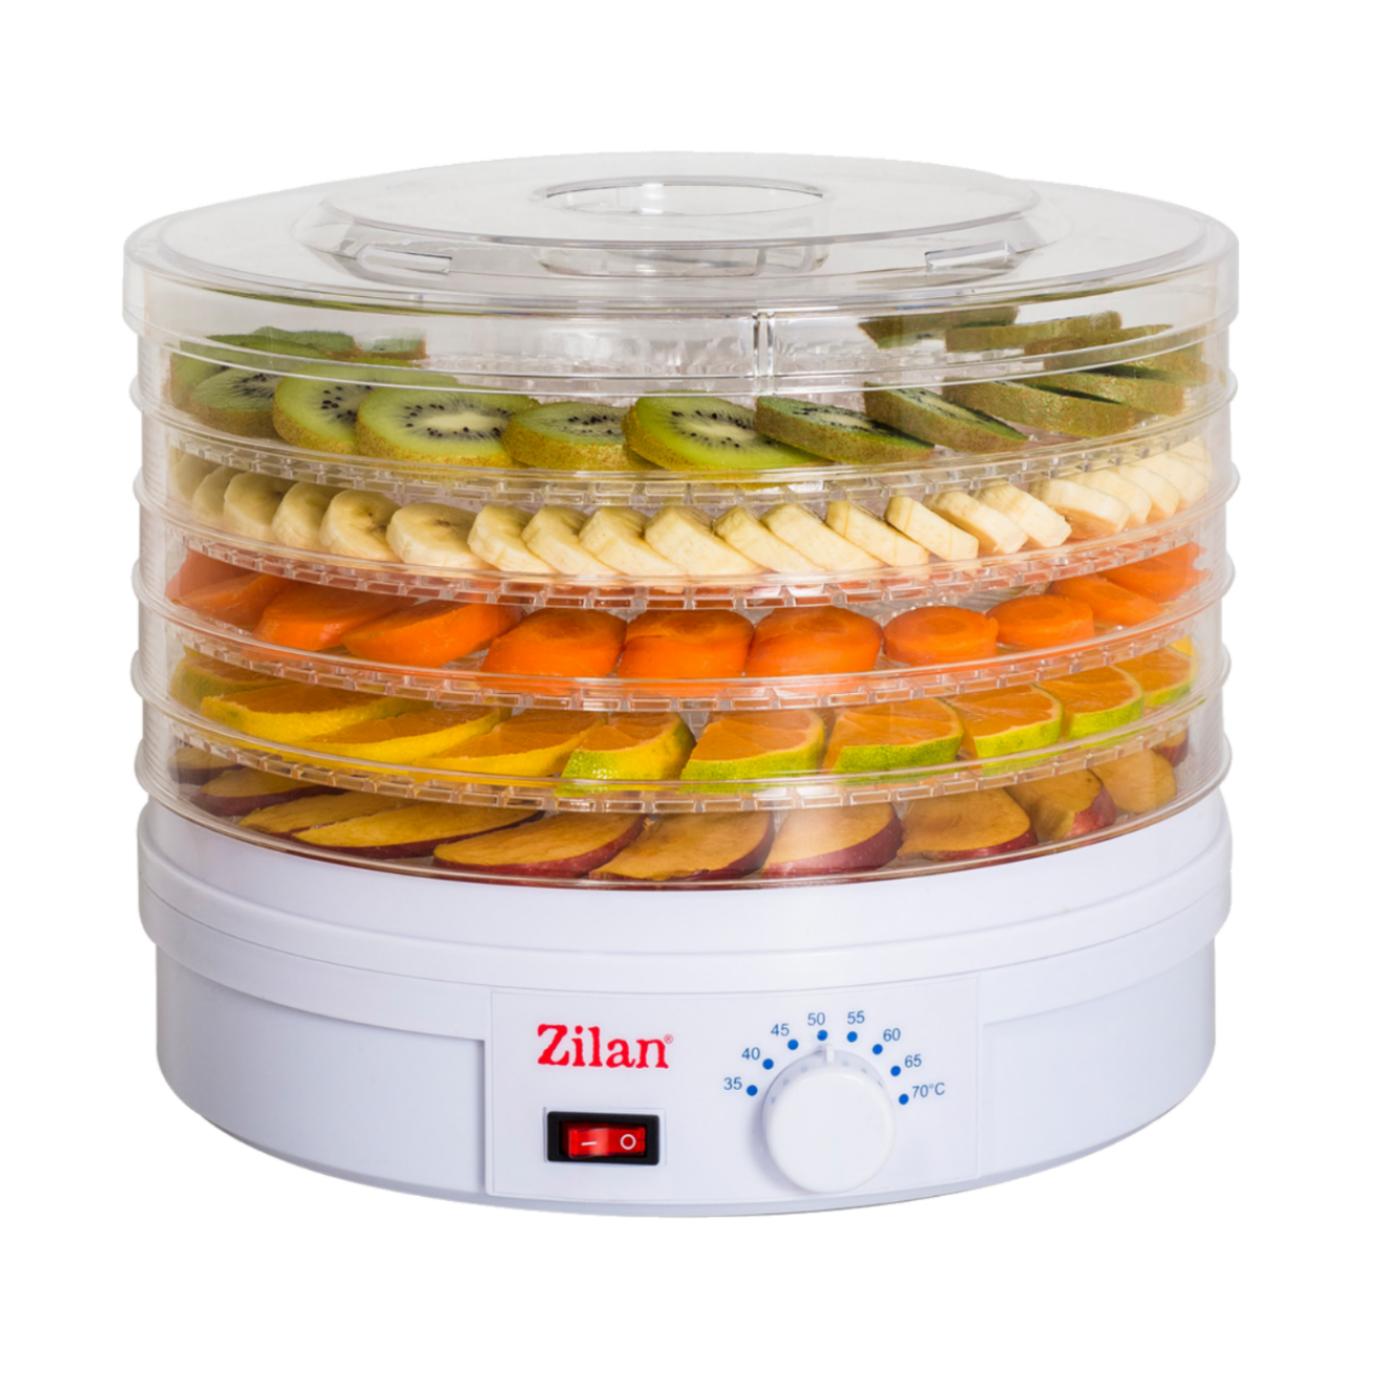 Zilan - ZLN9645